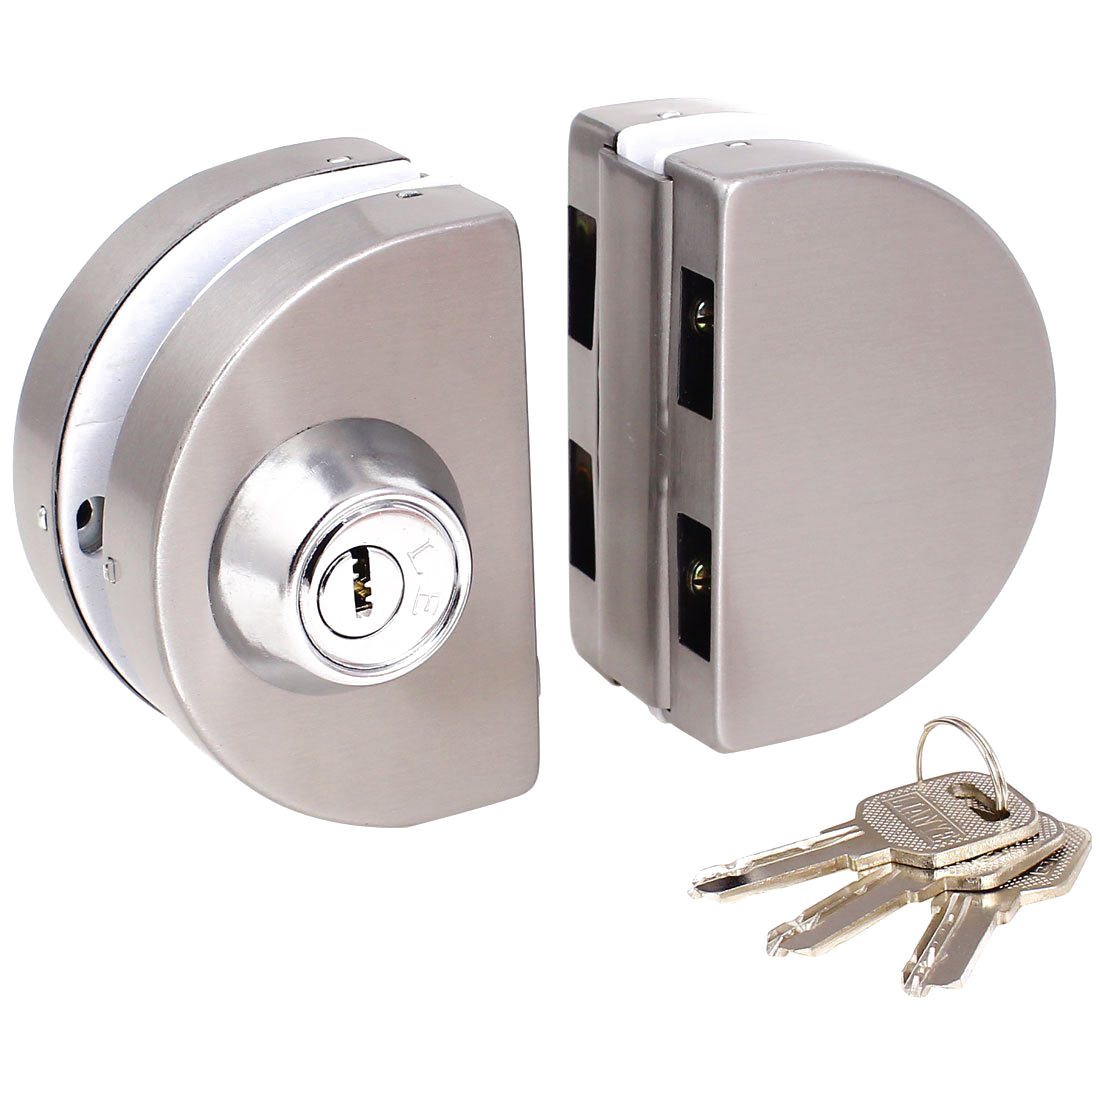 Compare prices on sliding door locks online shoppingbuy low entry gate 10 12mm glass swing push sliding door lock with keyschina vtopaller Gallery